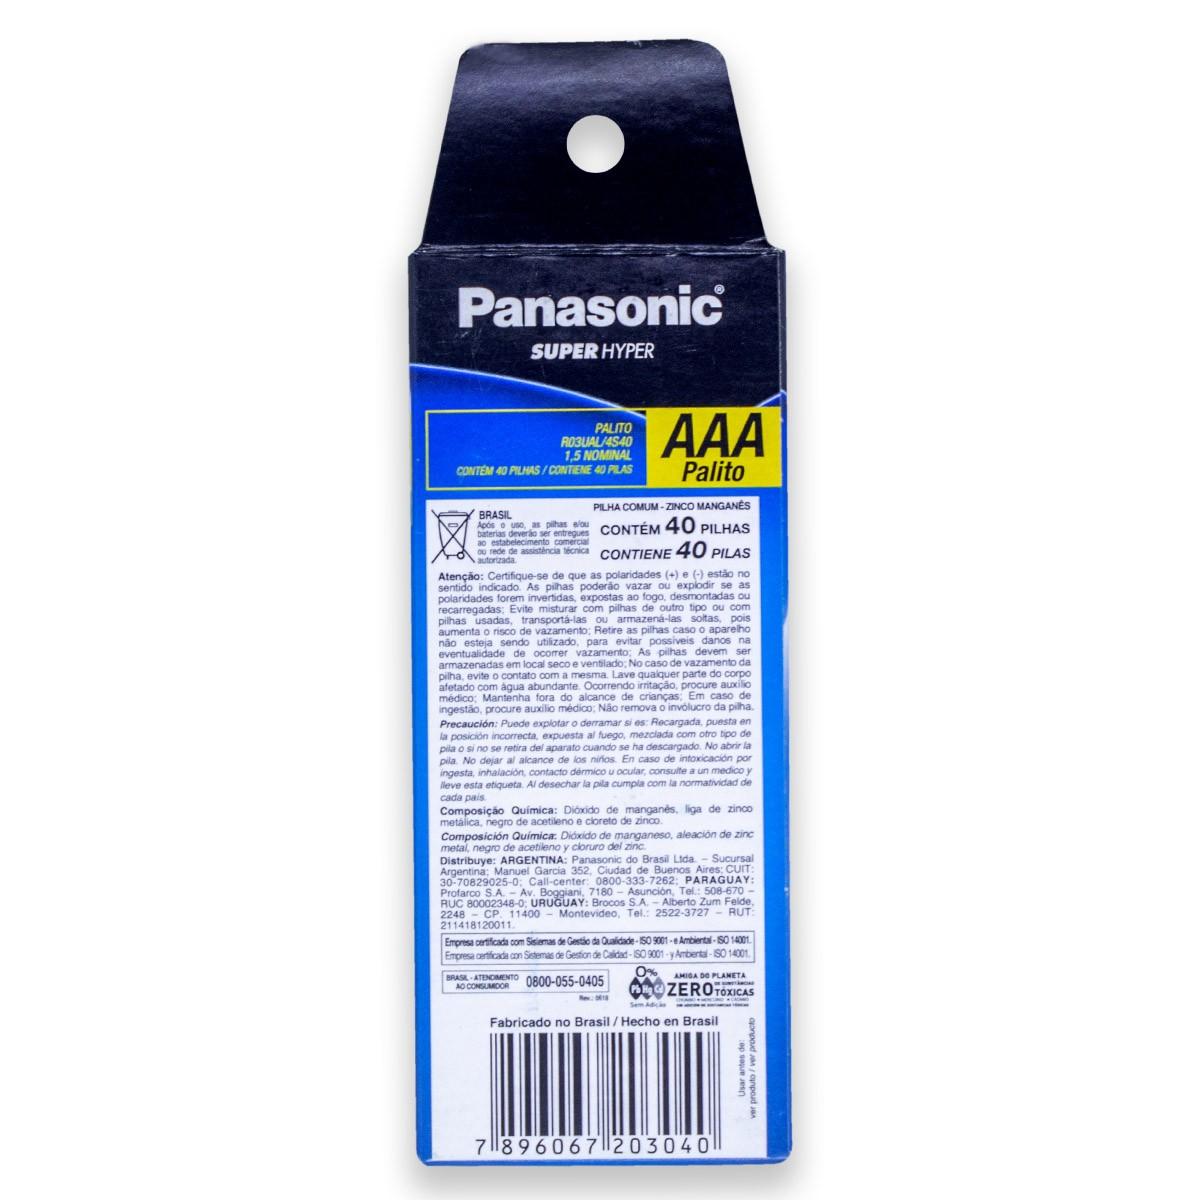 120 Pilhas AAA Zinco Carvão PANASONIC 3 tubos